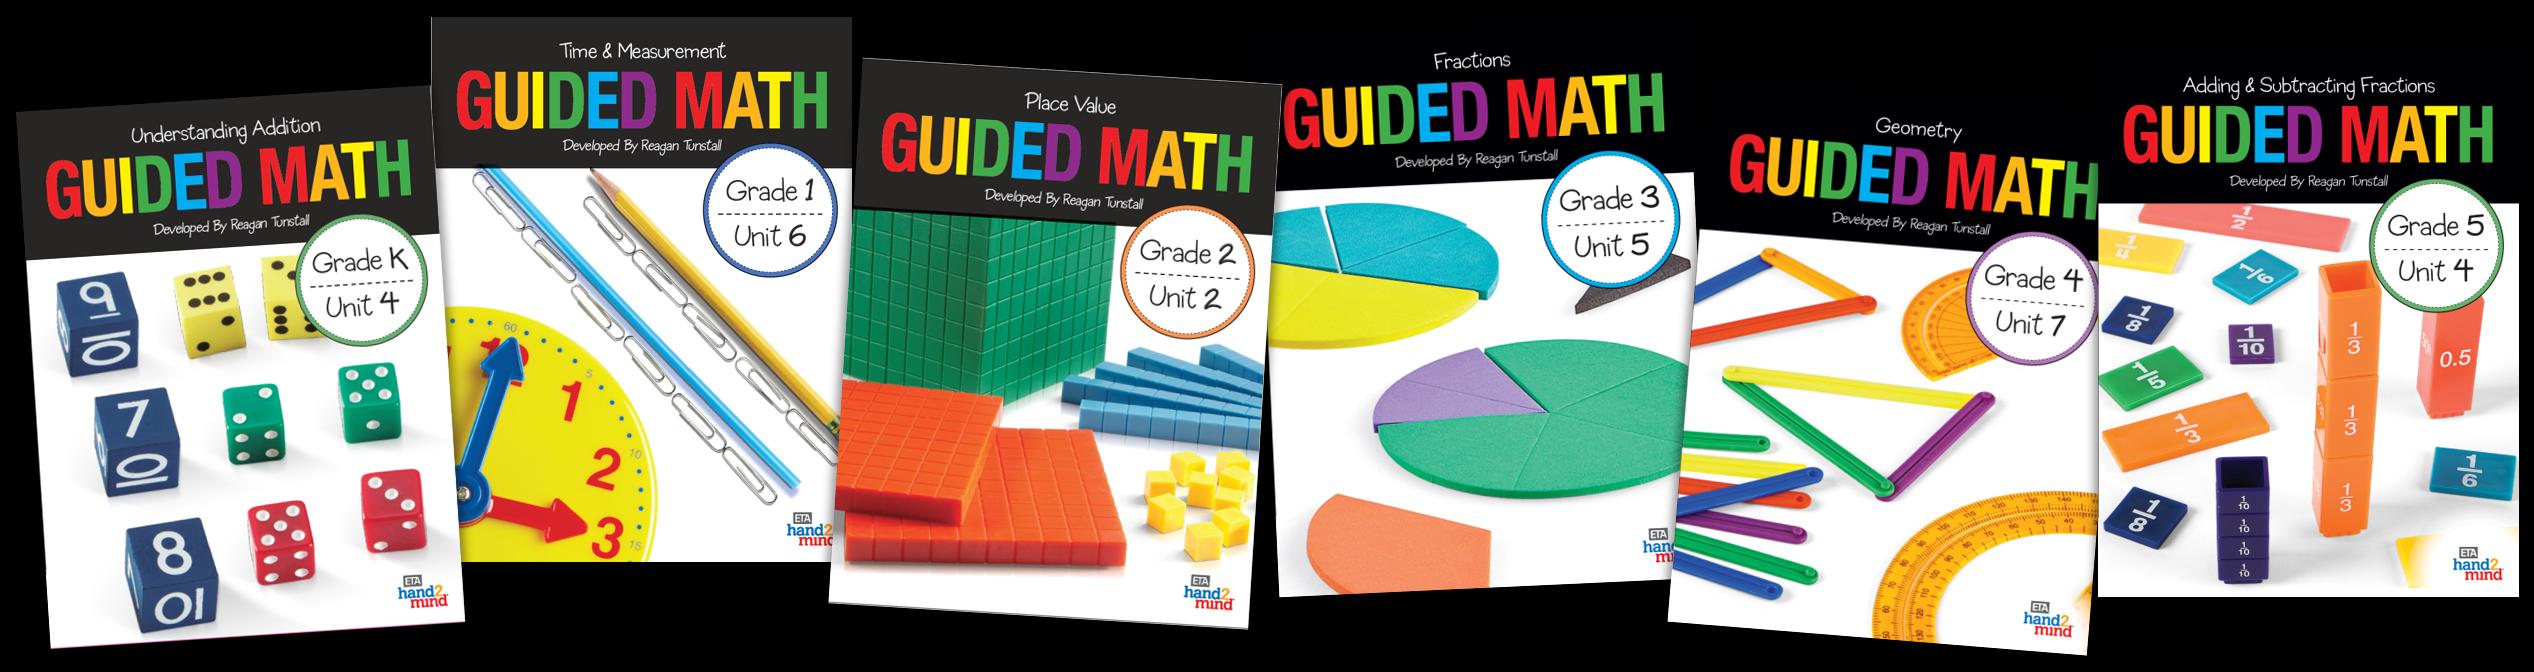 Guided Math Manipulatives